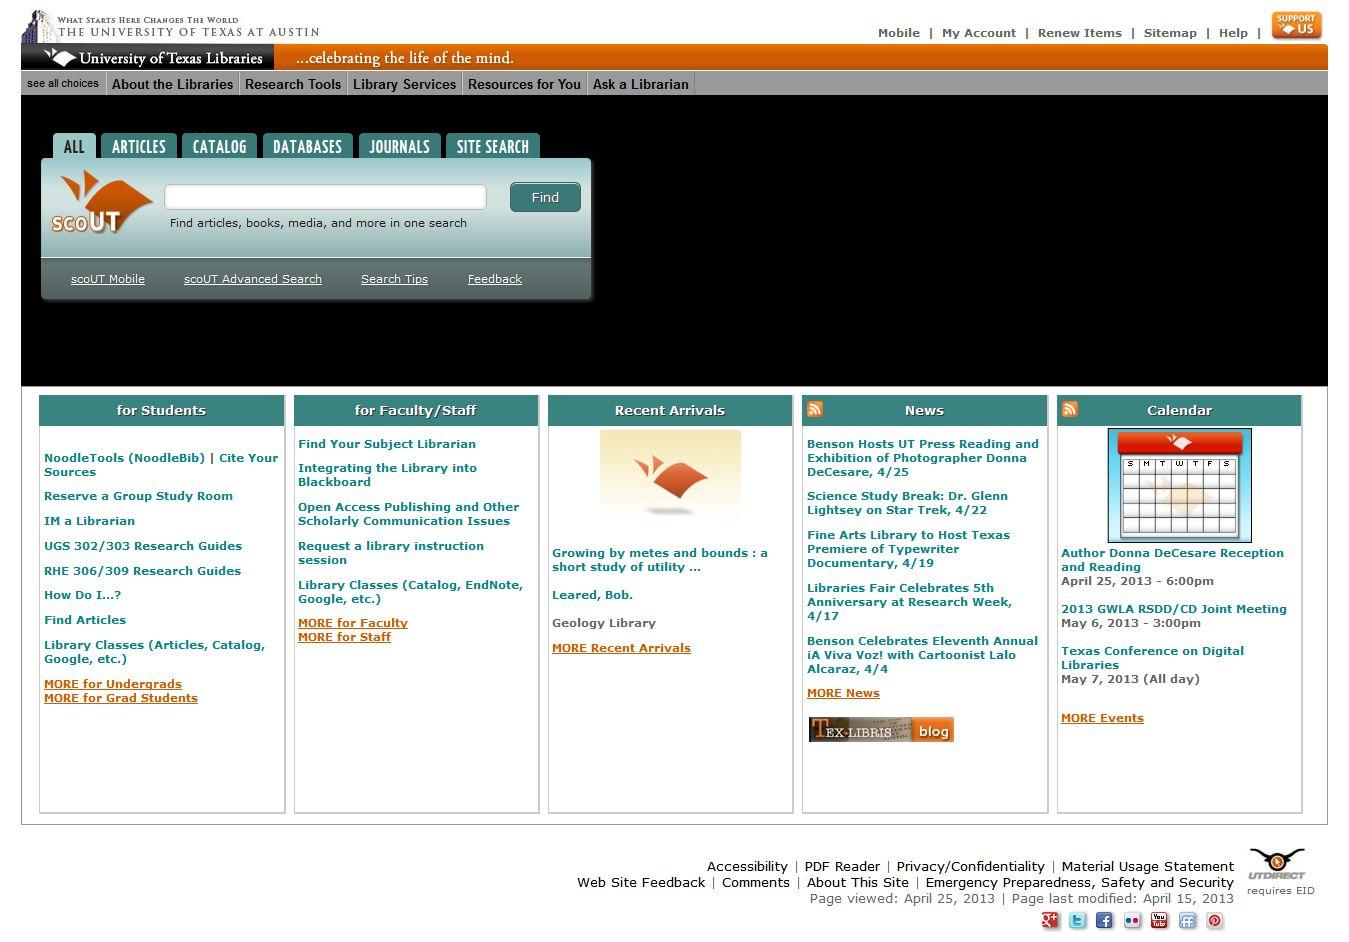 Current UT Libraries website